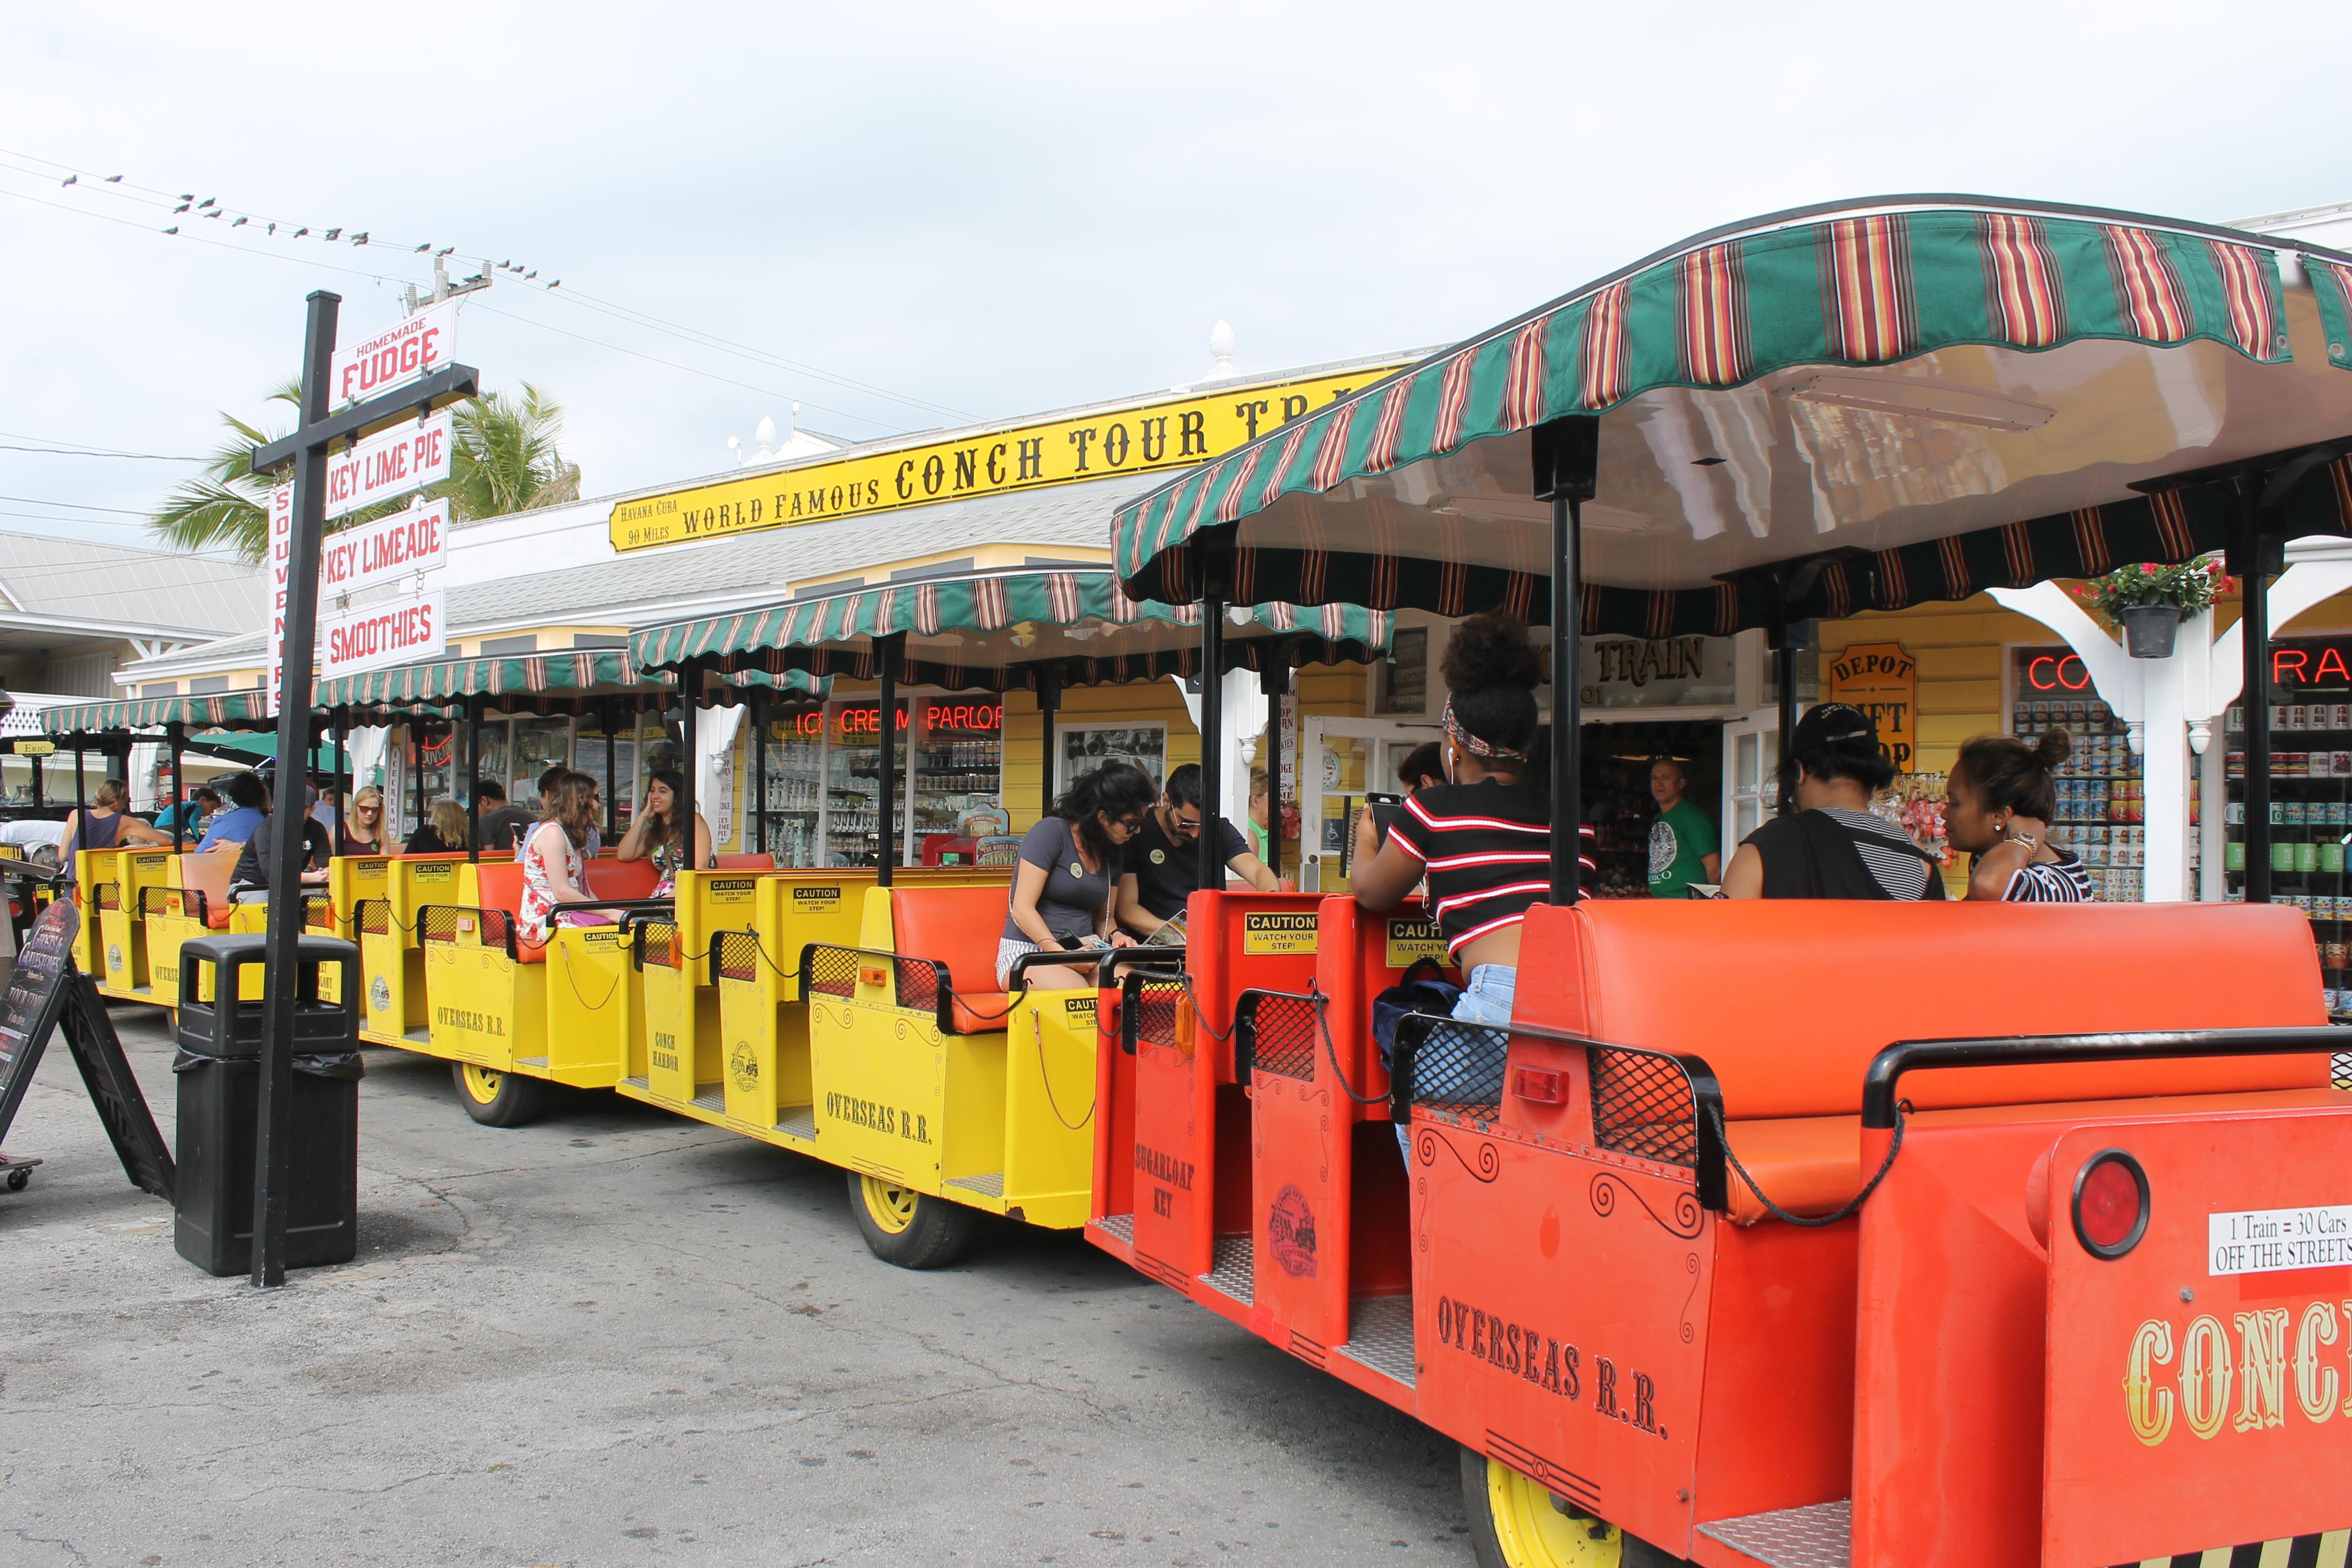 Train tours at Key West, Florida